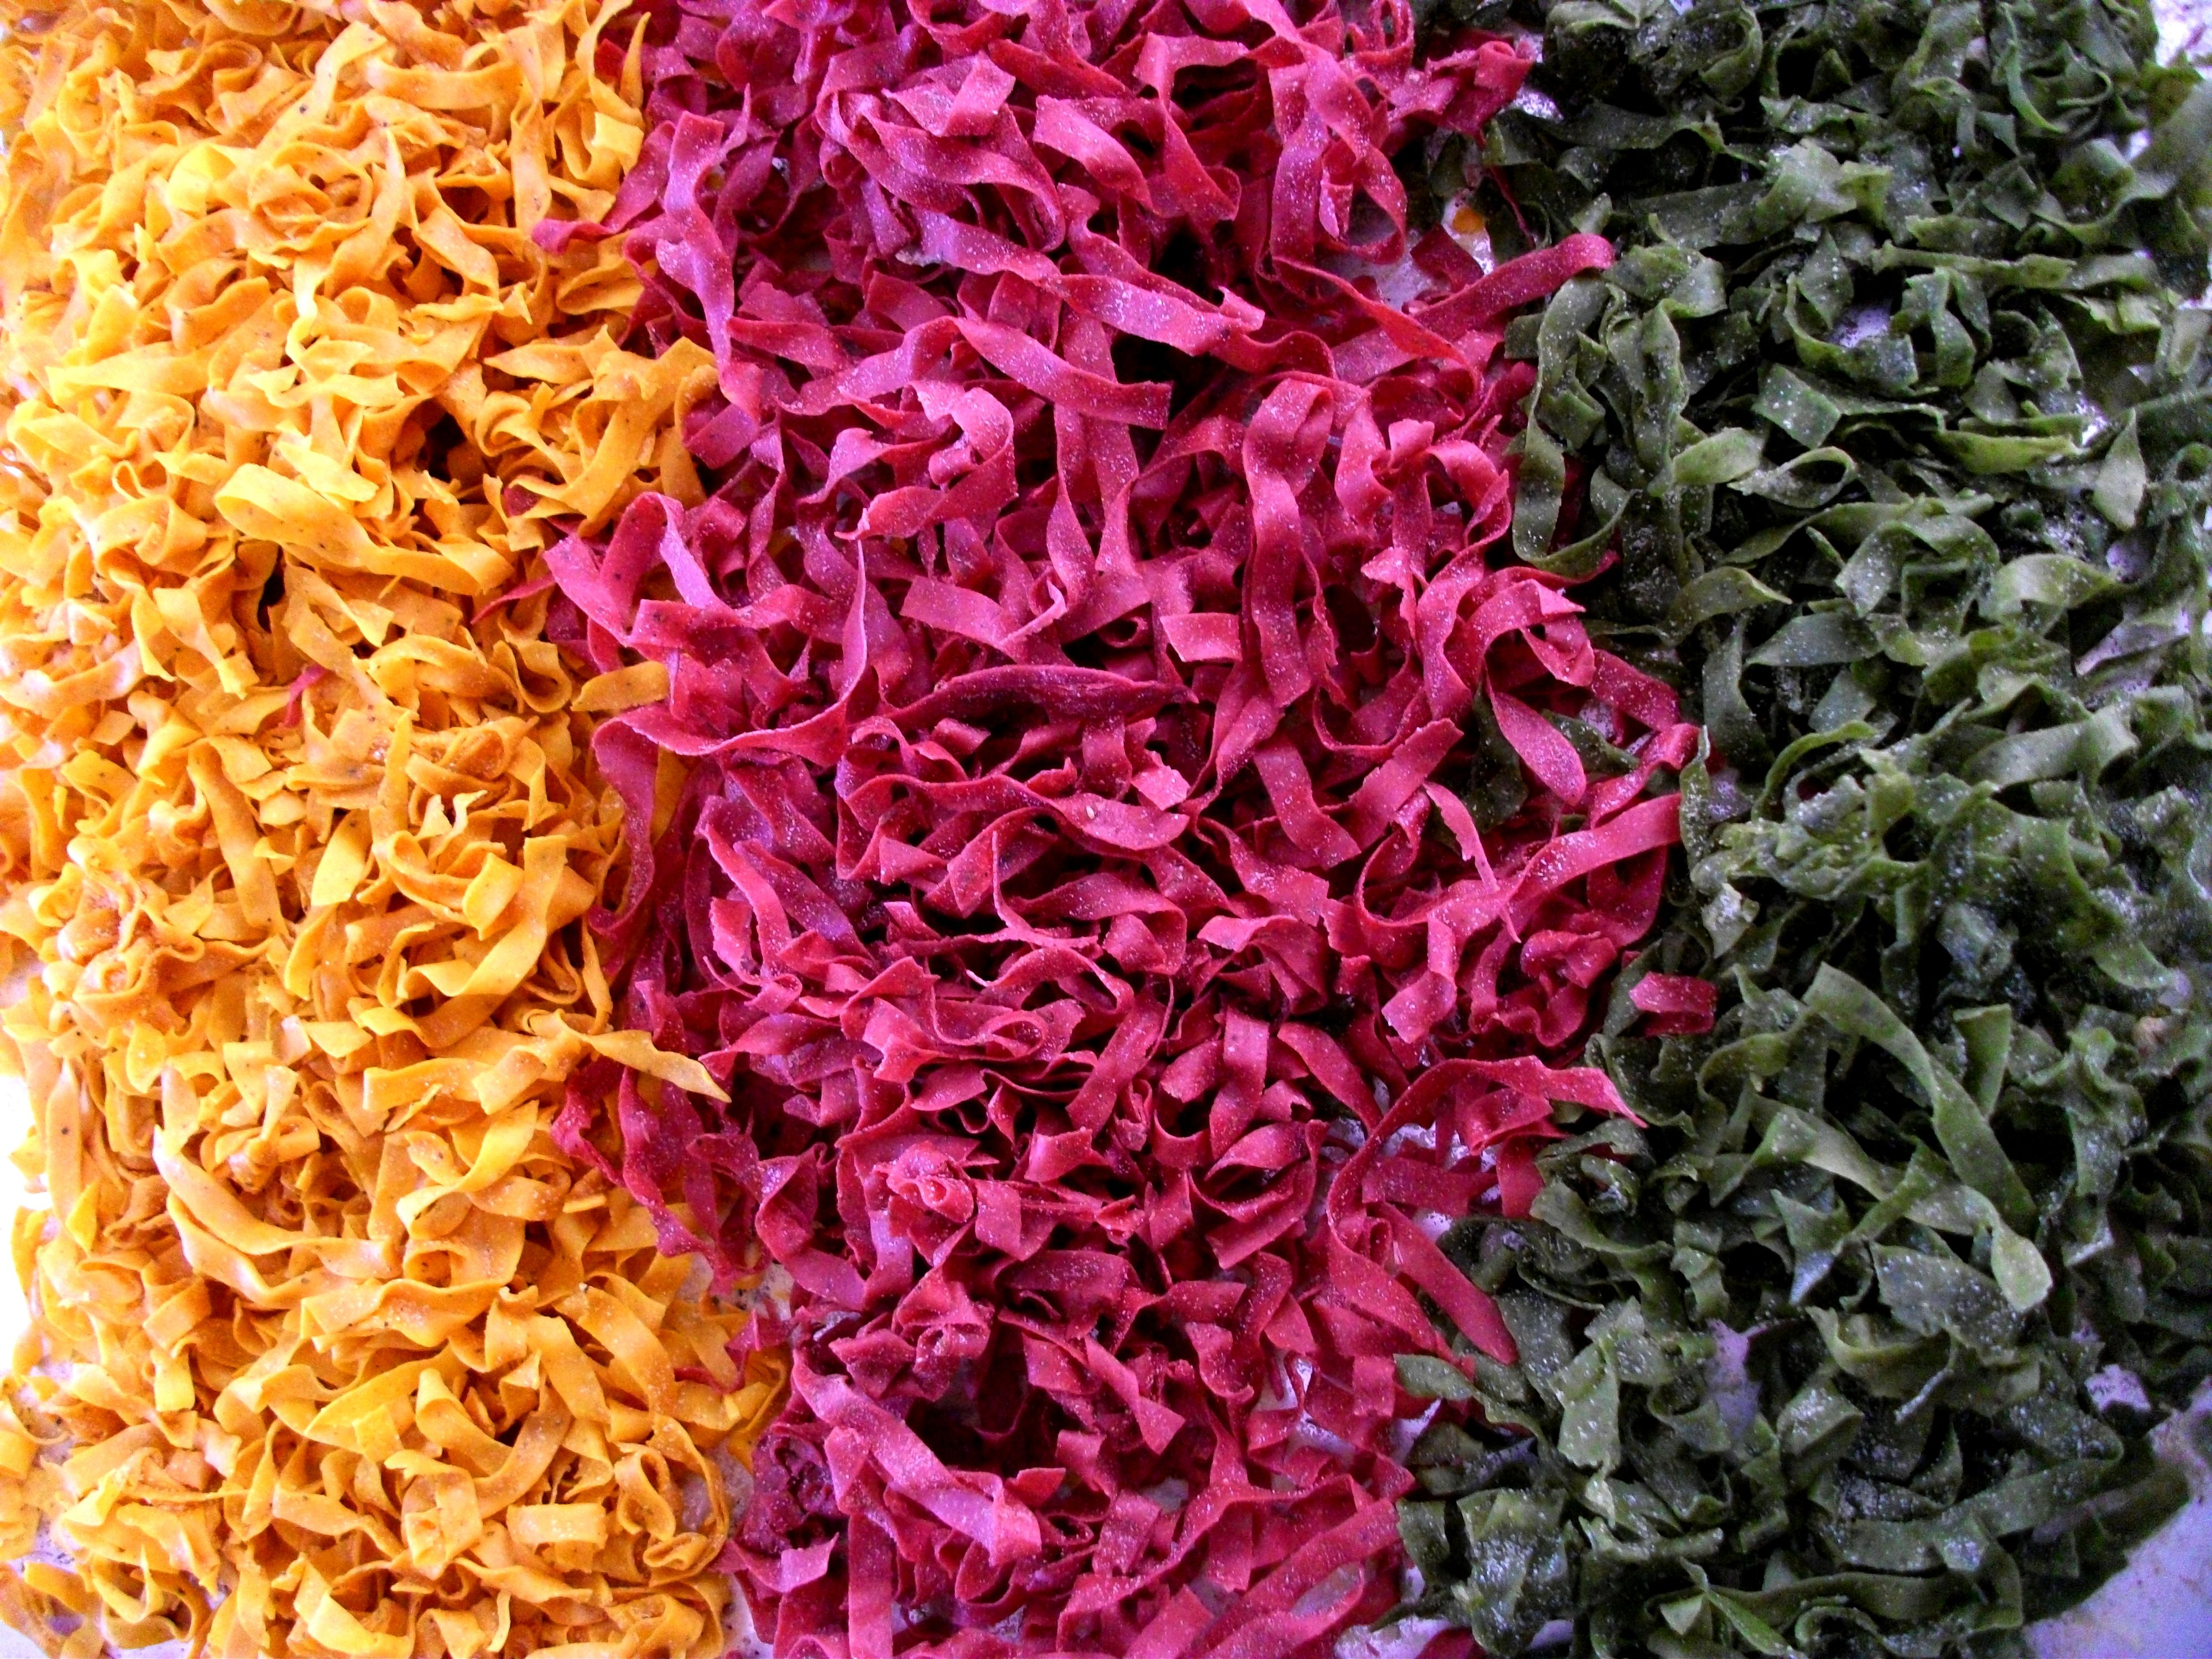 Pasta Noodles: Beet Root & Oregano (Purple) / Tumeric & Black Pepper (Yellow) / Spinach & Parsley (Green)